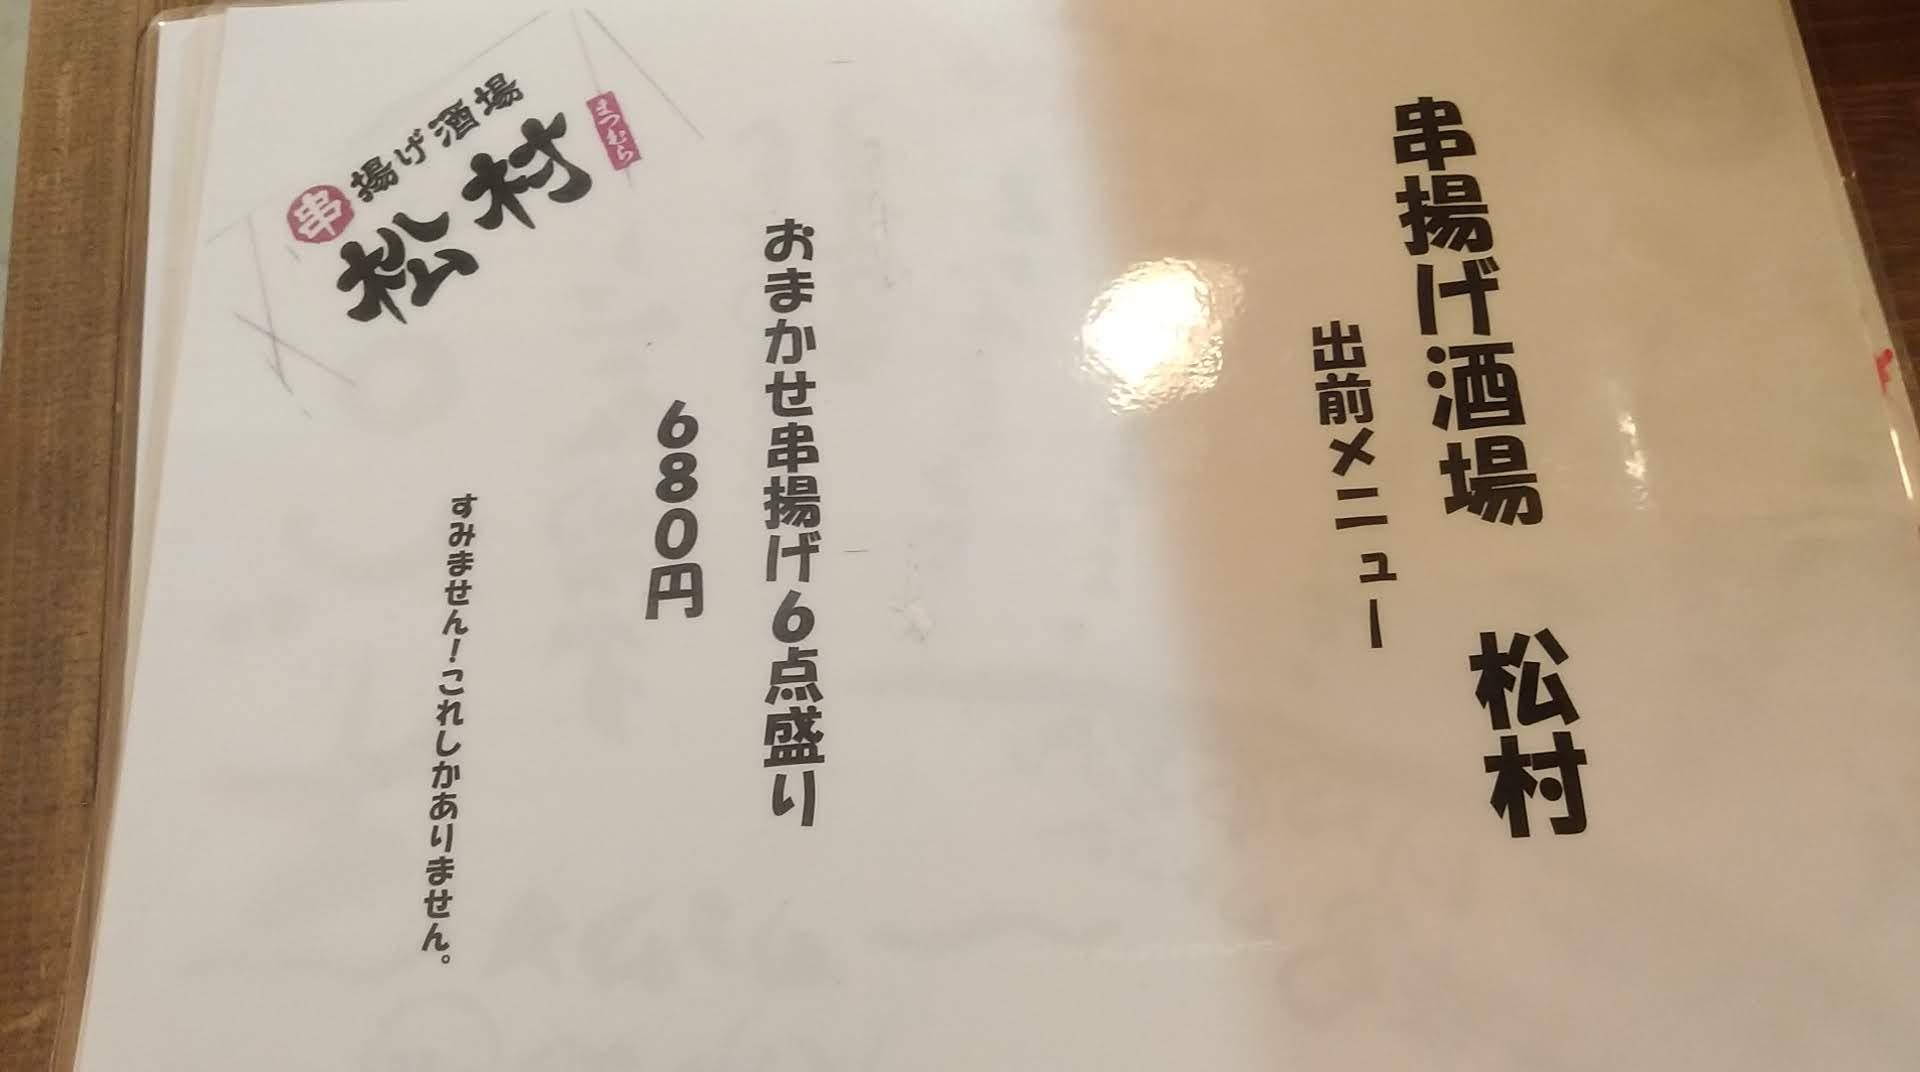 the delivery menu of Muramatsu